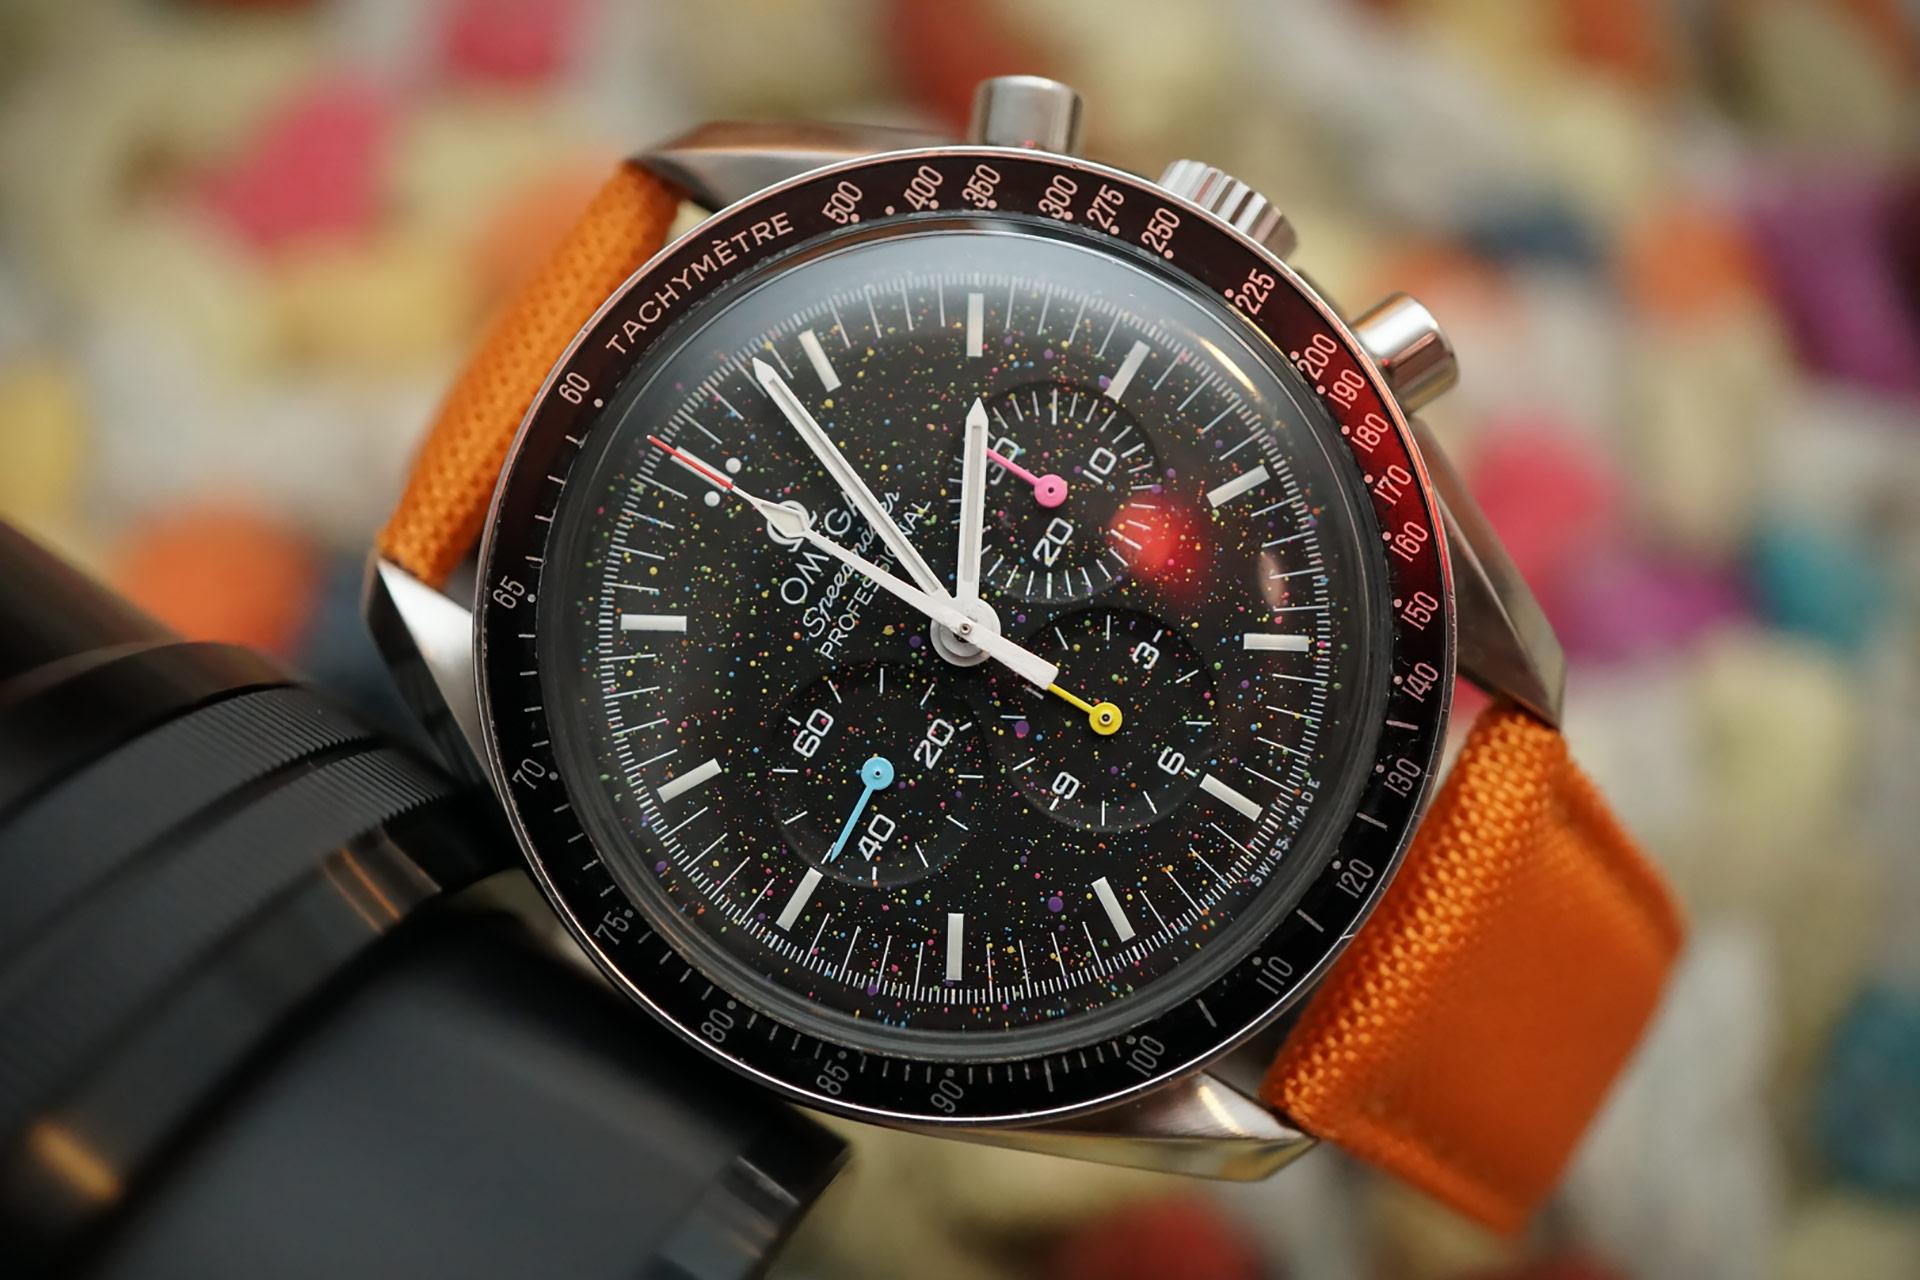 Creo Cosmic Omega Speedmaster Professional Watch